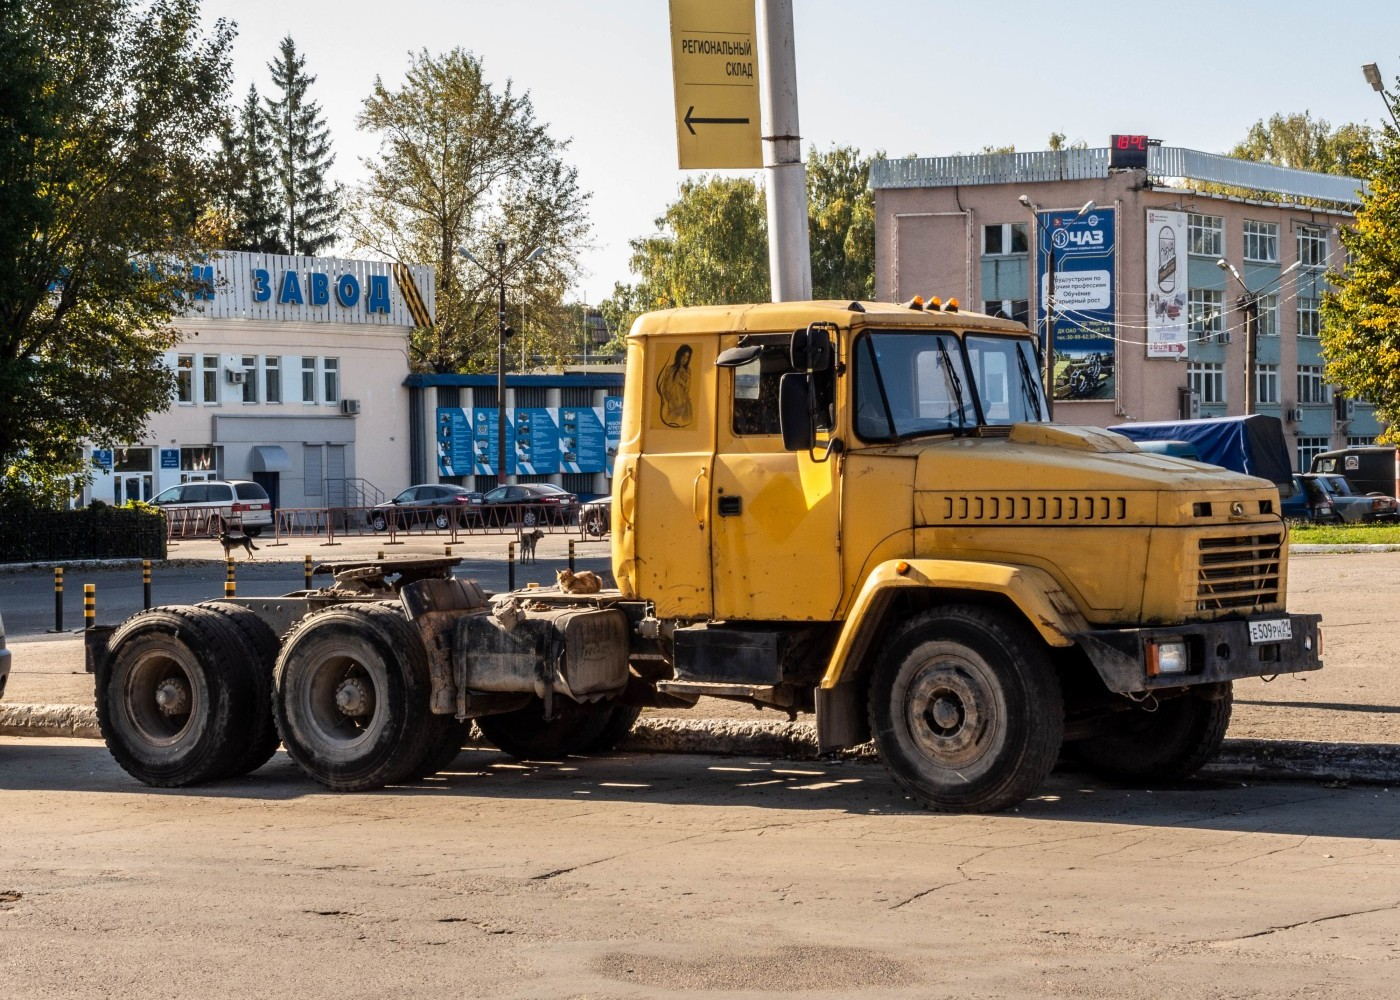 грузовой автомобиль КрАЗ-6444 #Е509РН21. Чувашия, г. Чебоксары, ул. Калинина